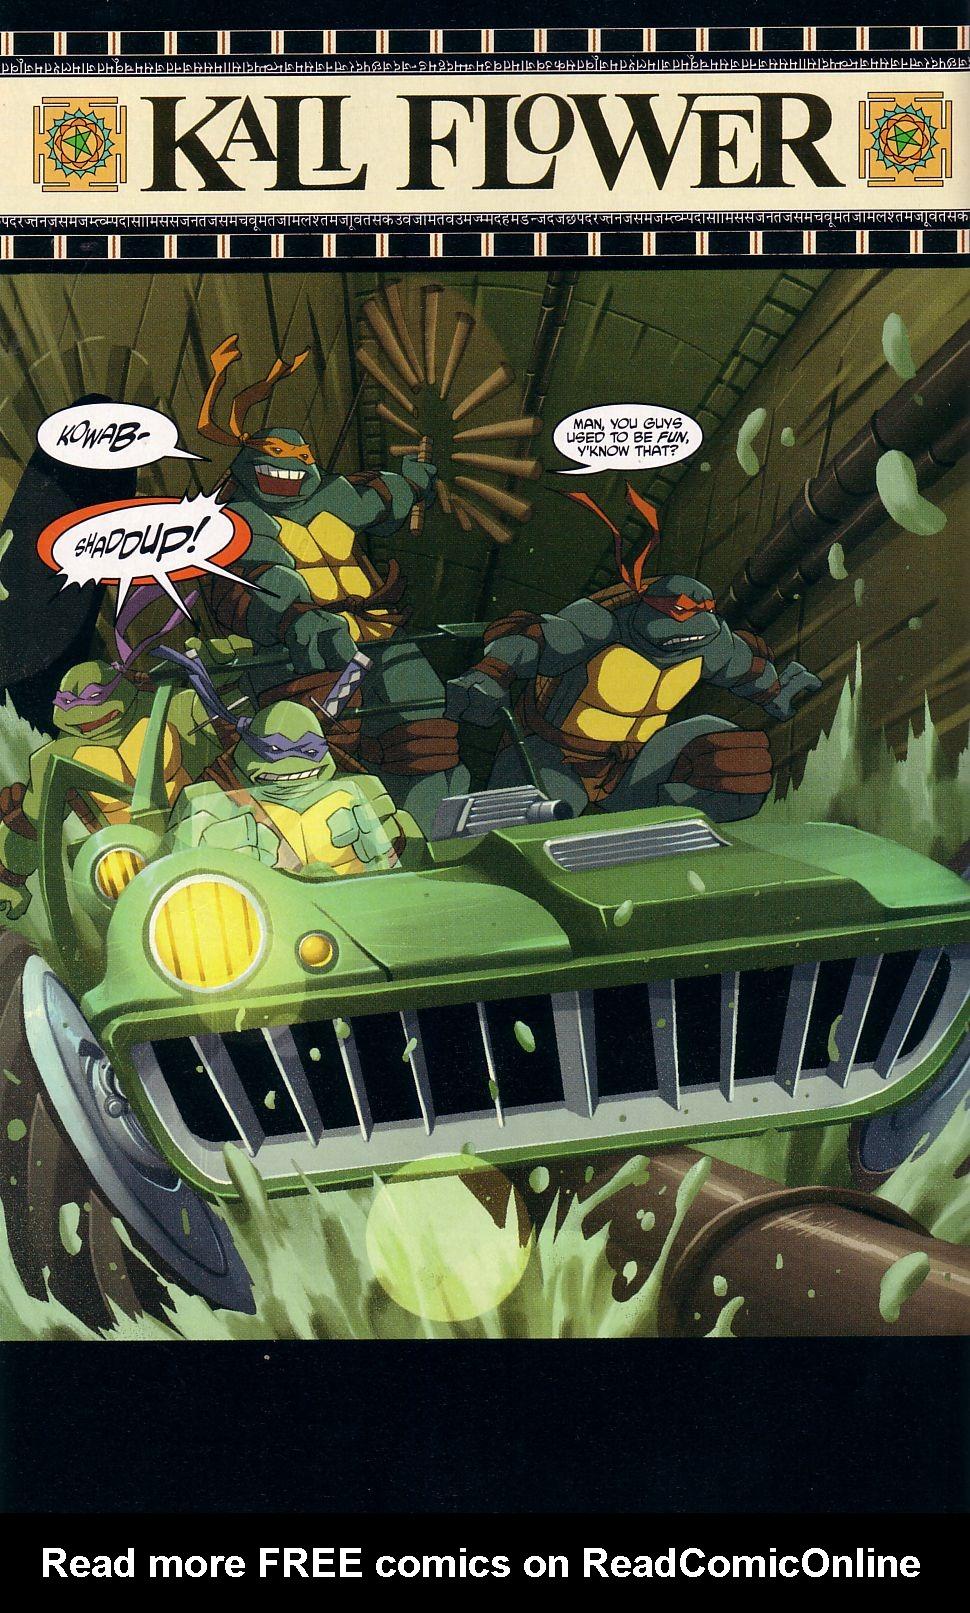 Teenage Mutant Ninja Turtles (2003) chap 7 pic 10